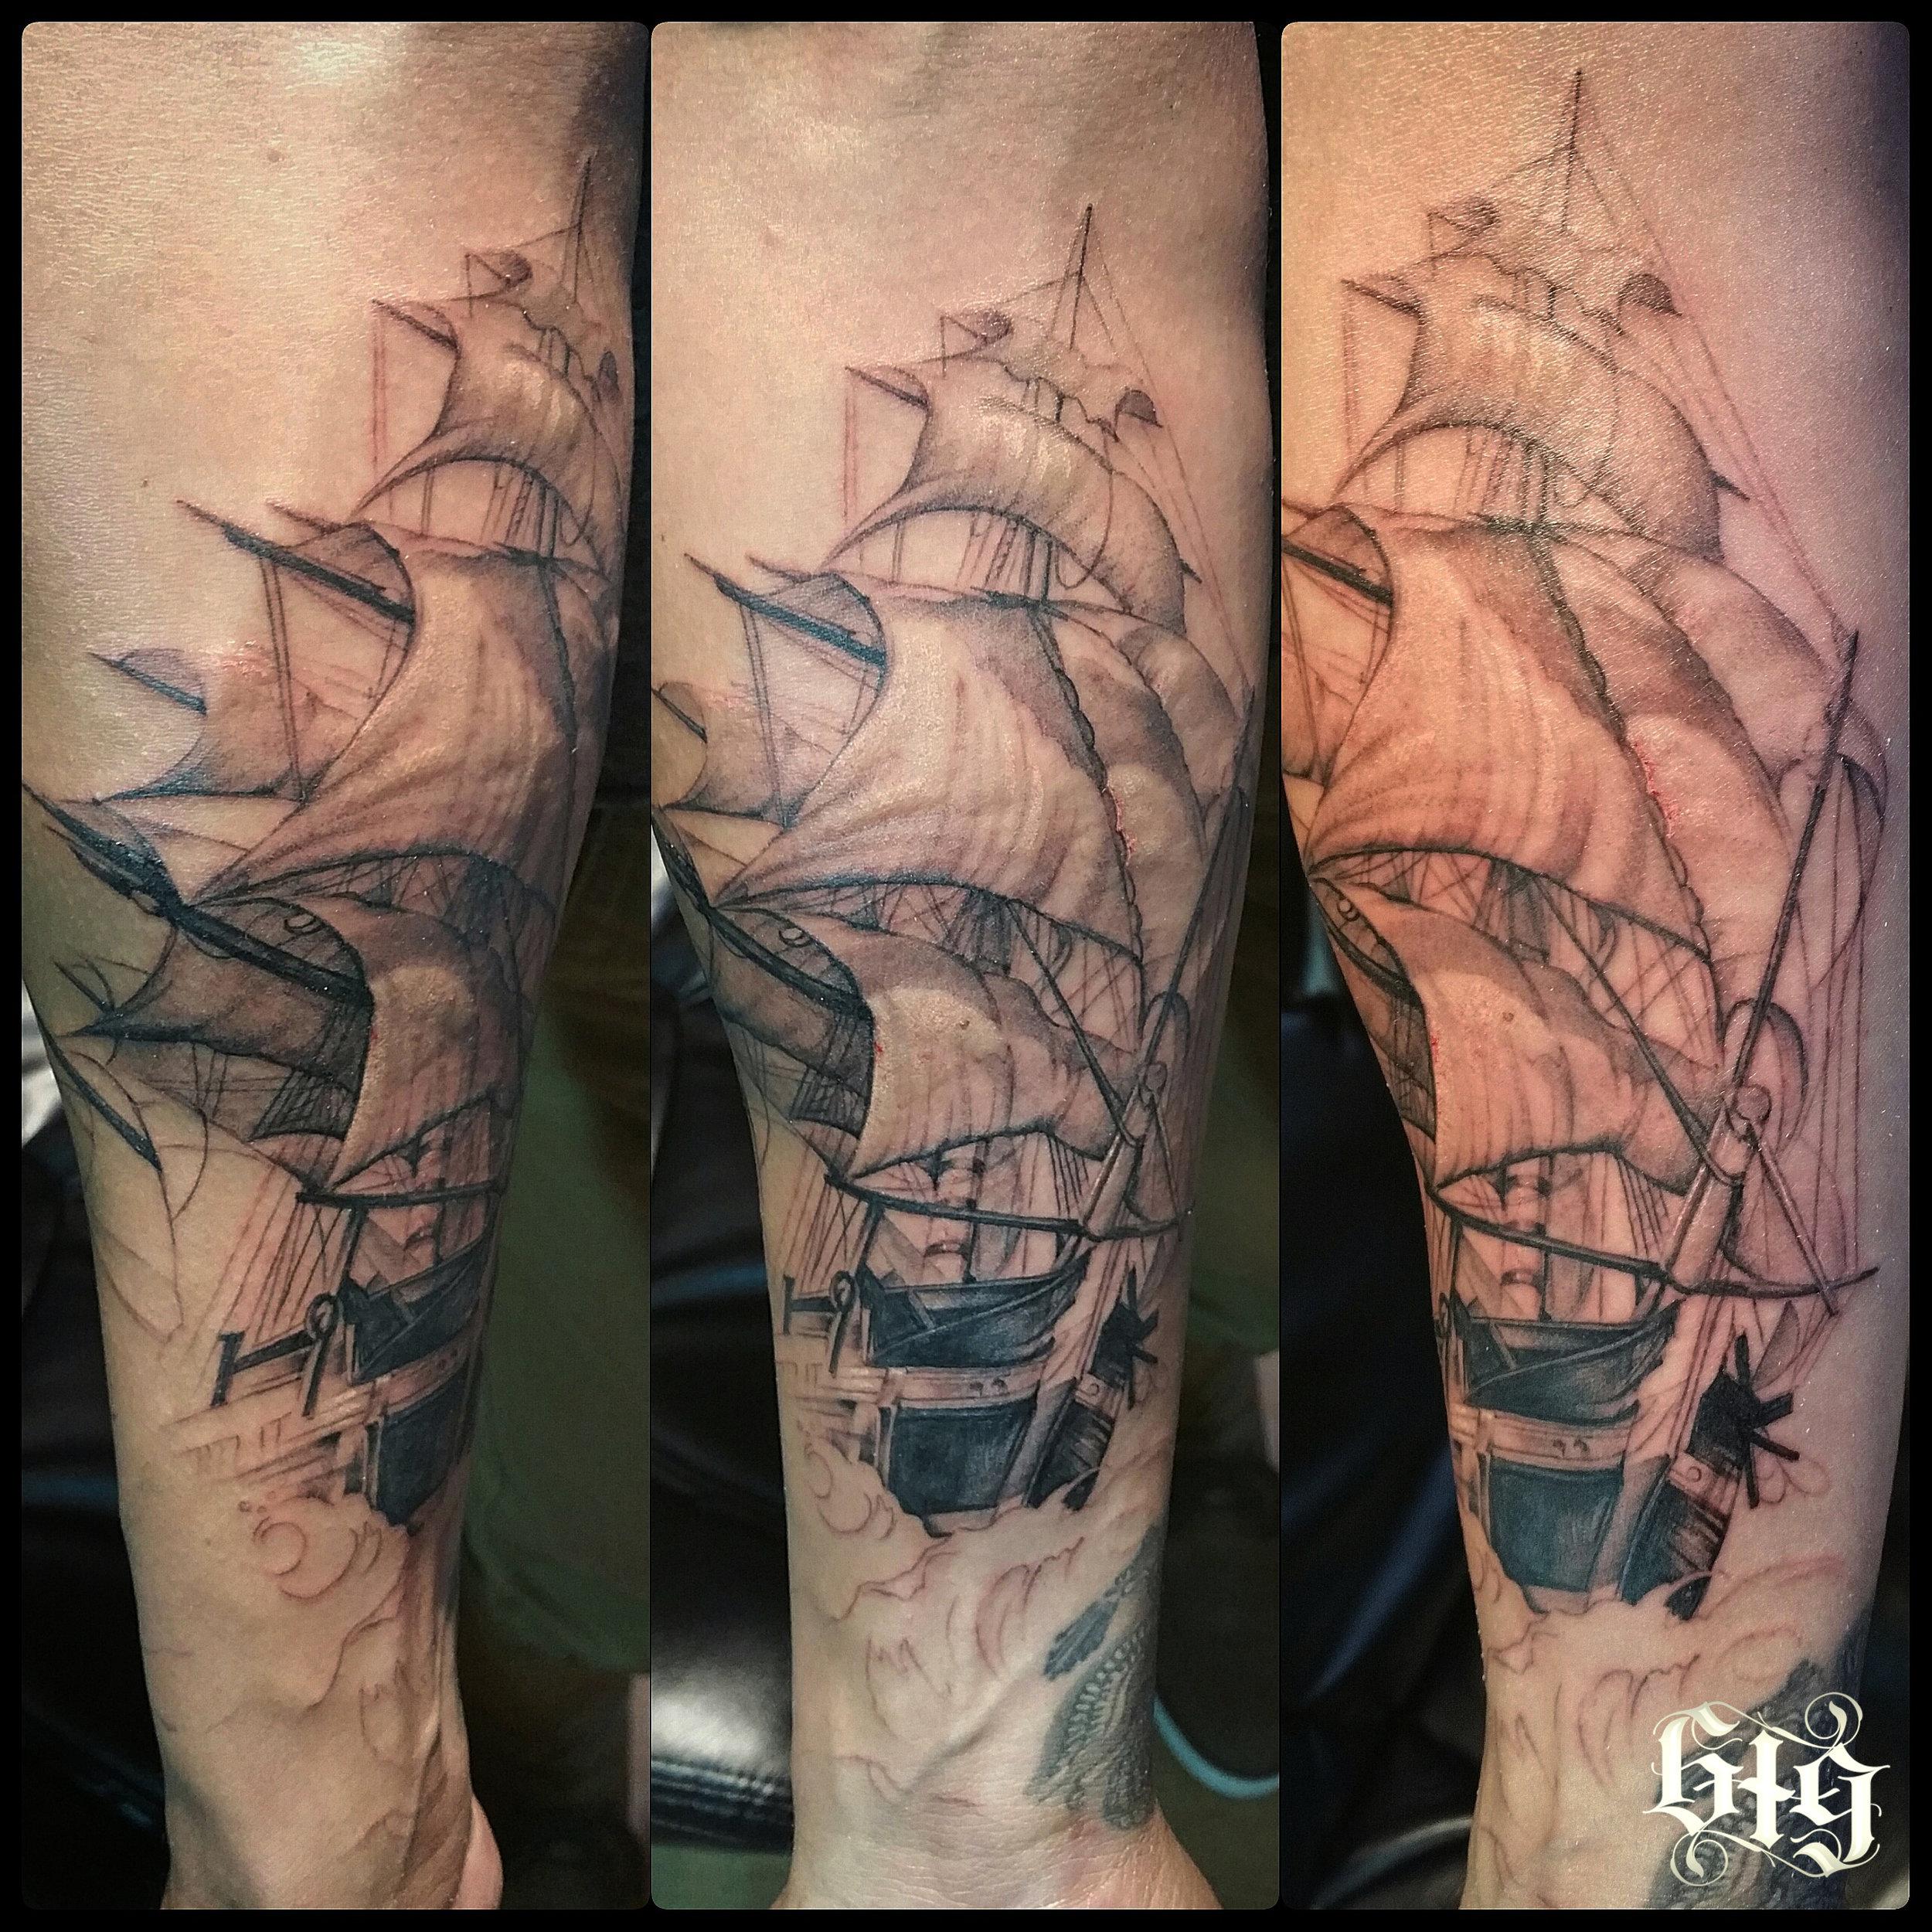 Realistic clipper ship sailing the high seas black and gray tattoo in progress.